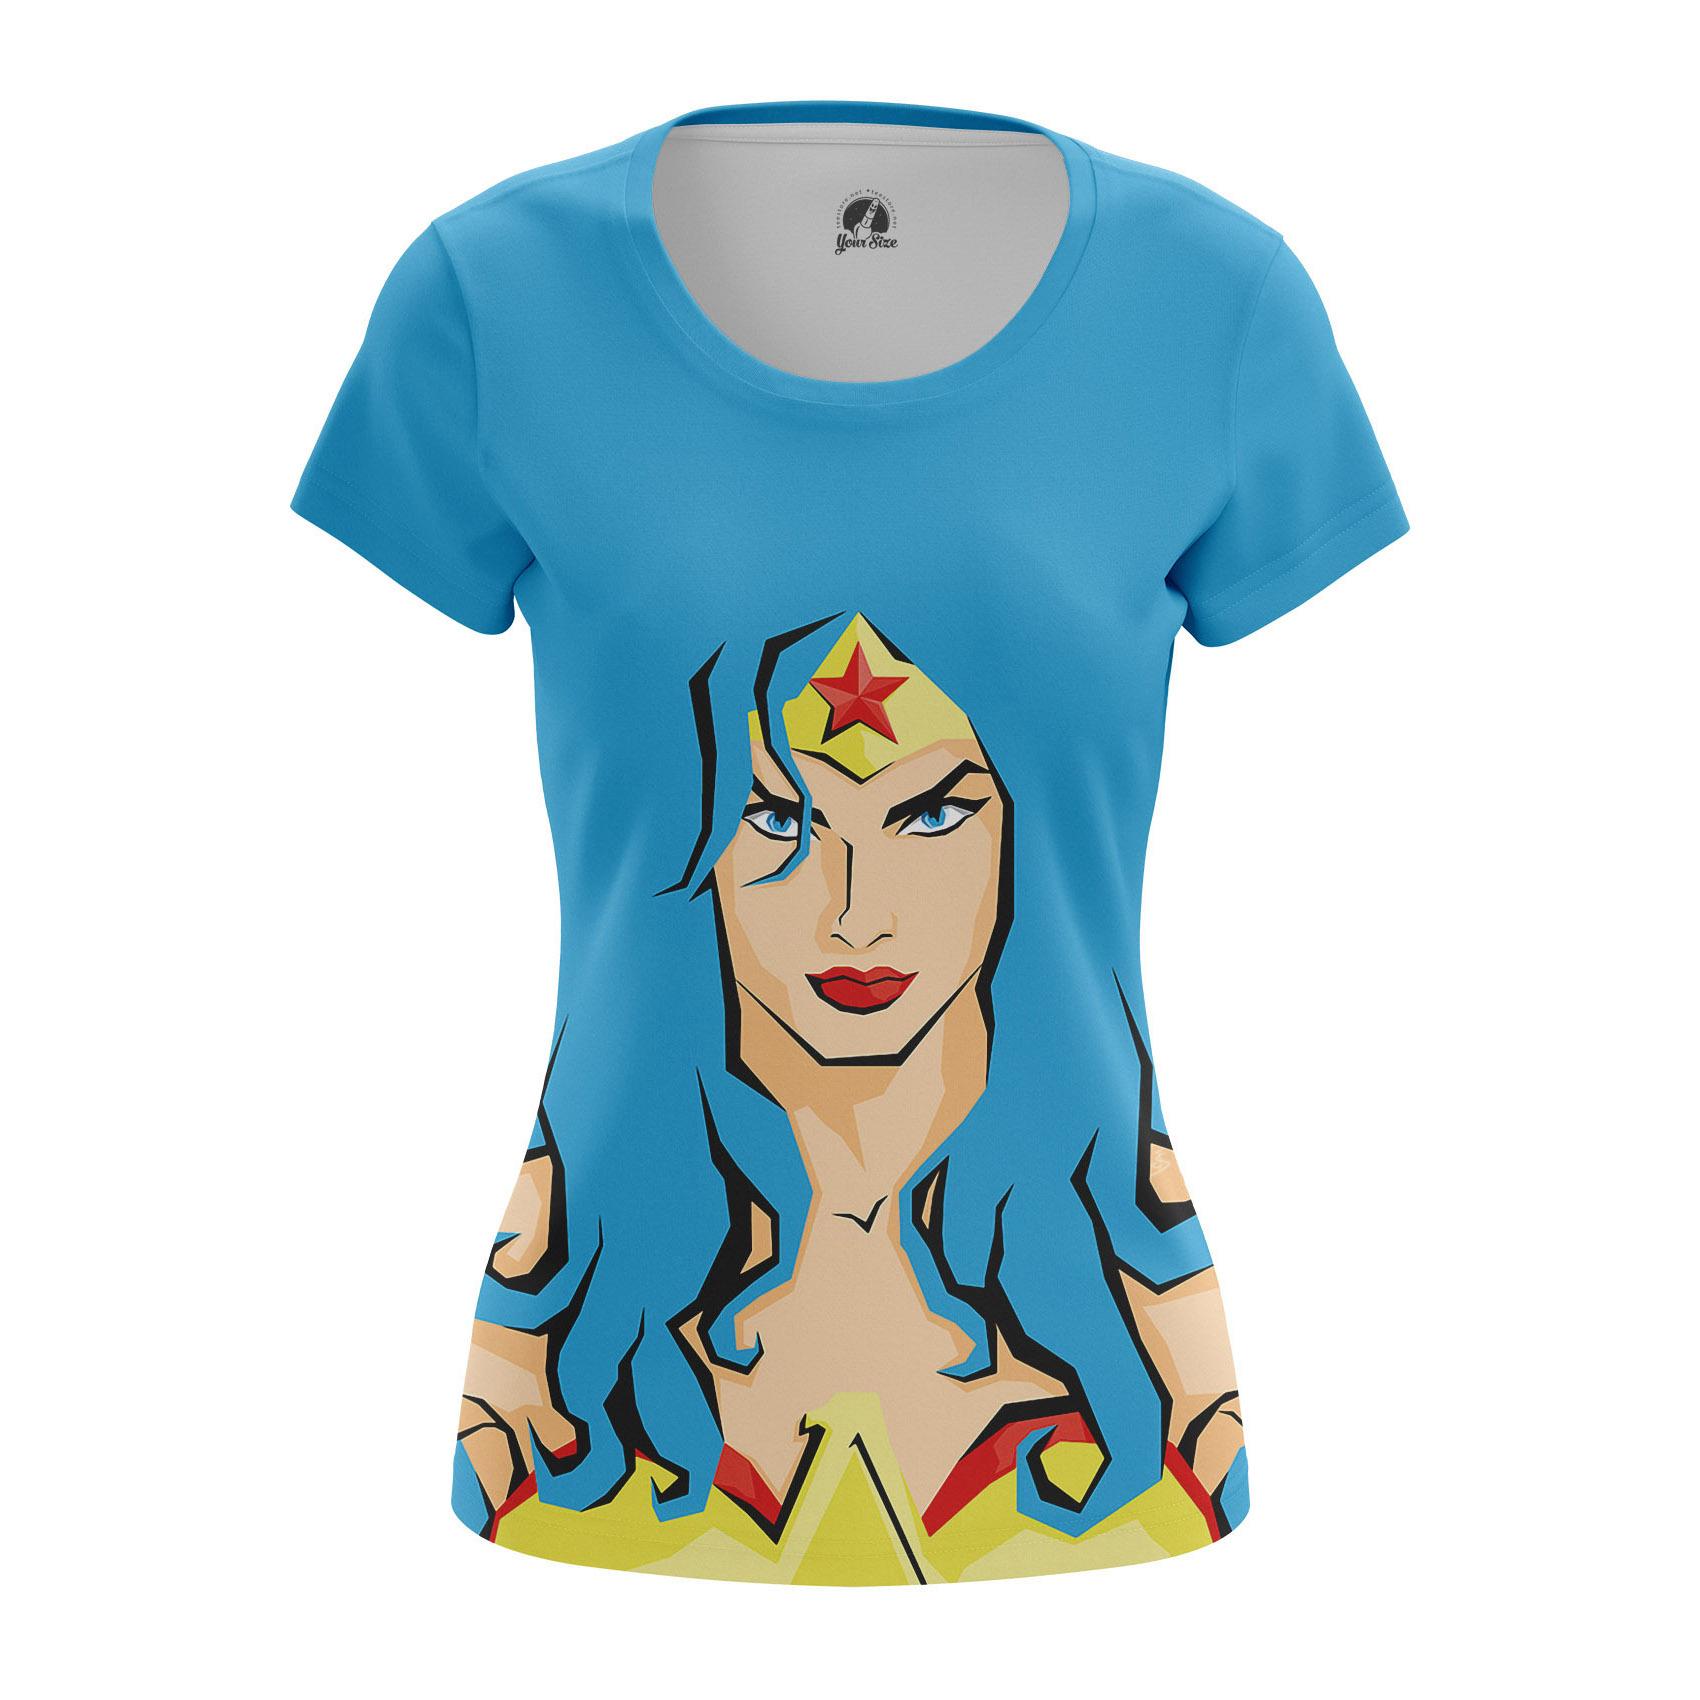 Collectibles Women'S Raglan Diana Wonder Woman